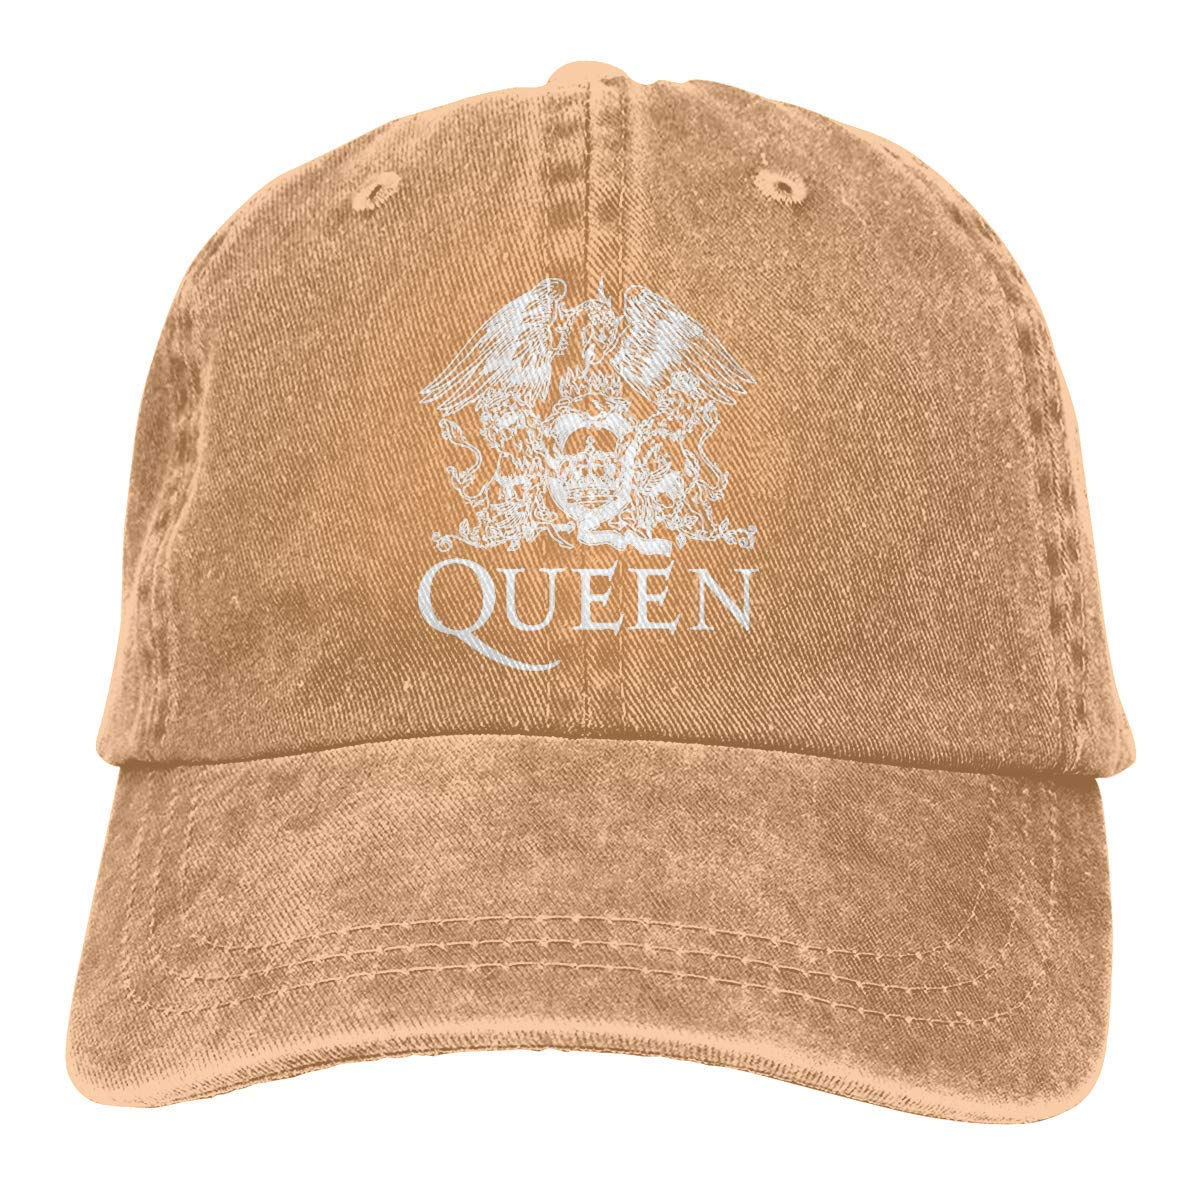 YINGSSMZ Queen Band Sports Denim Cap Adjustable Snapback Casquettes Unisex Plain Baseball Cowboy Hat Black